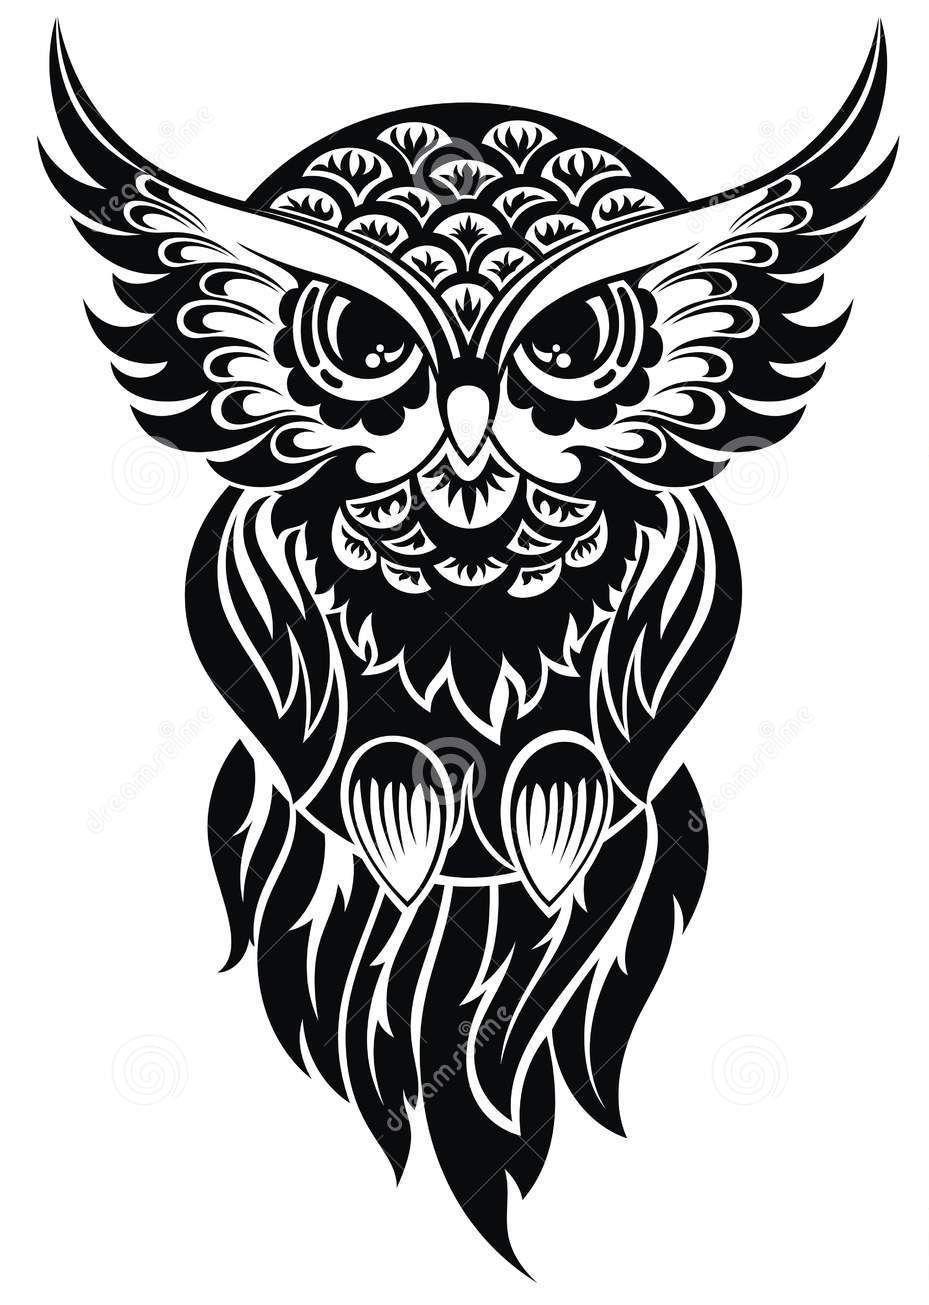 Pin By Marye Garibay On Inked Owl Tattoo Design Tribal Owl Tattoos Owl Tattoo